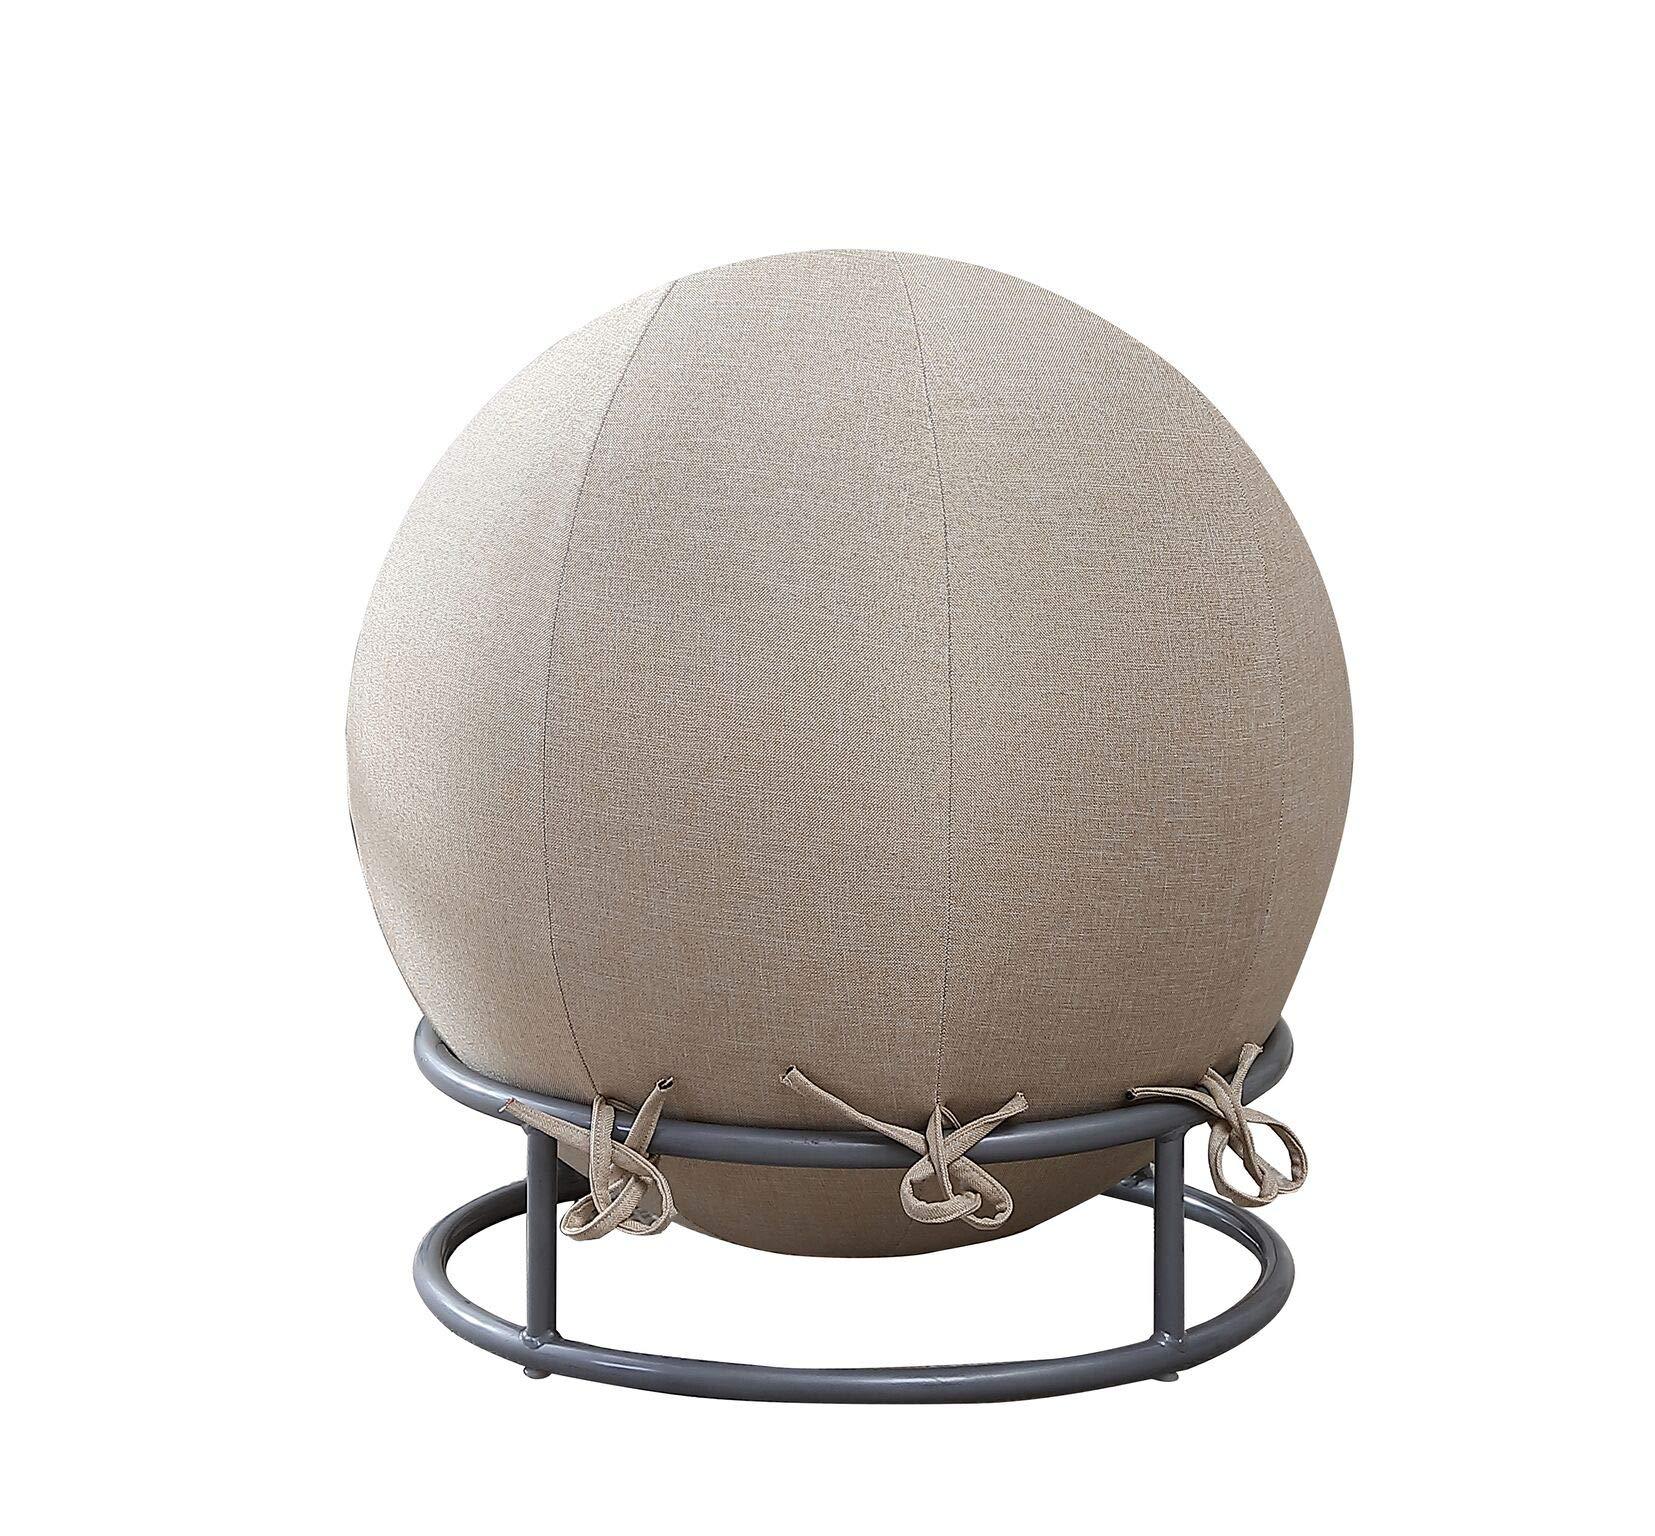 GoodGram Premium Posture Denim Fabric Yoga Exercise Balance Ball & Chair Set - Assorted Colors (Denim Linen)